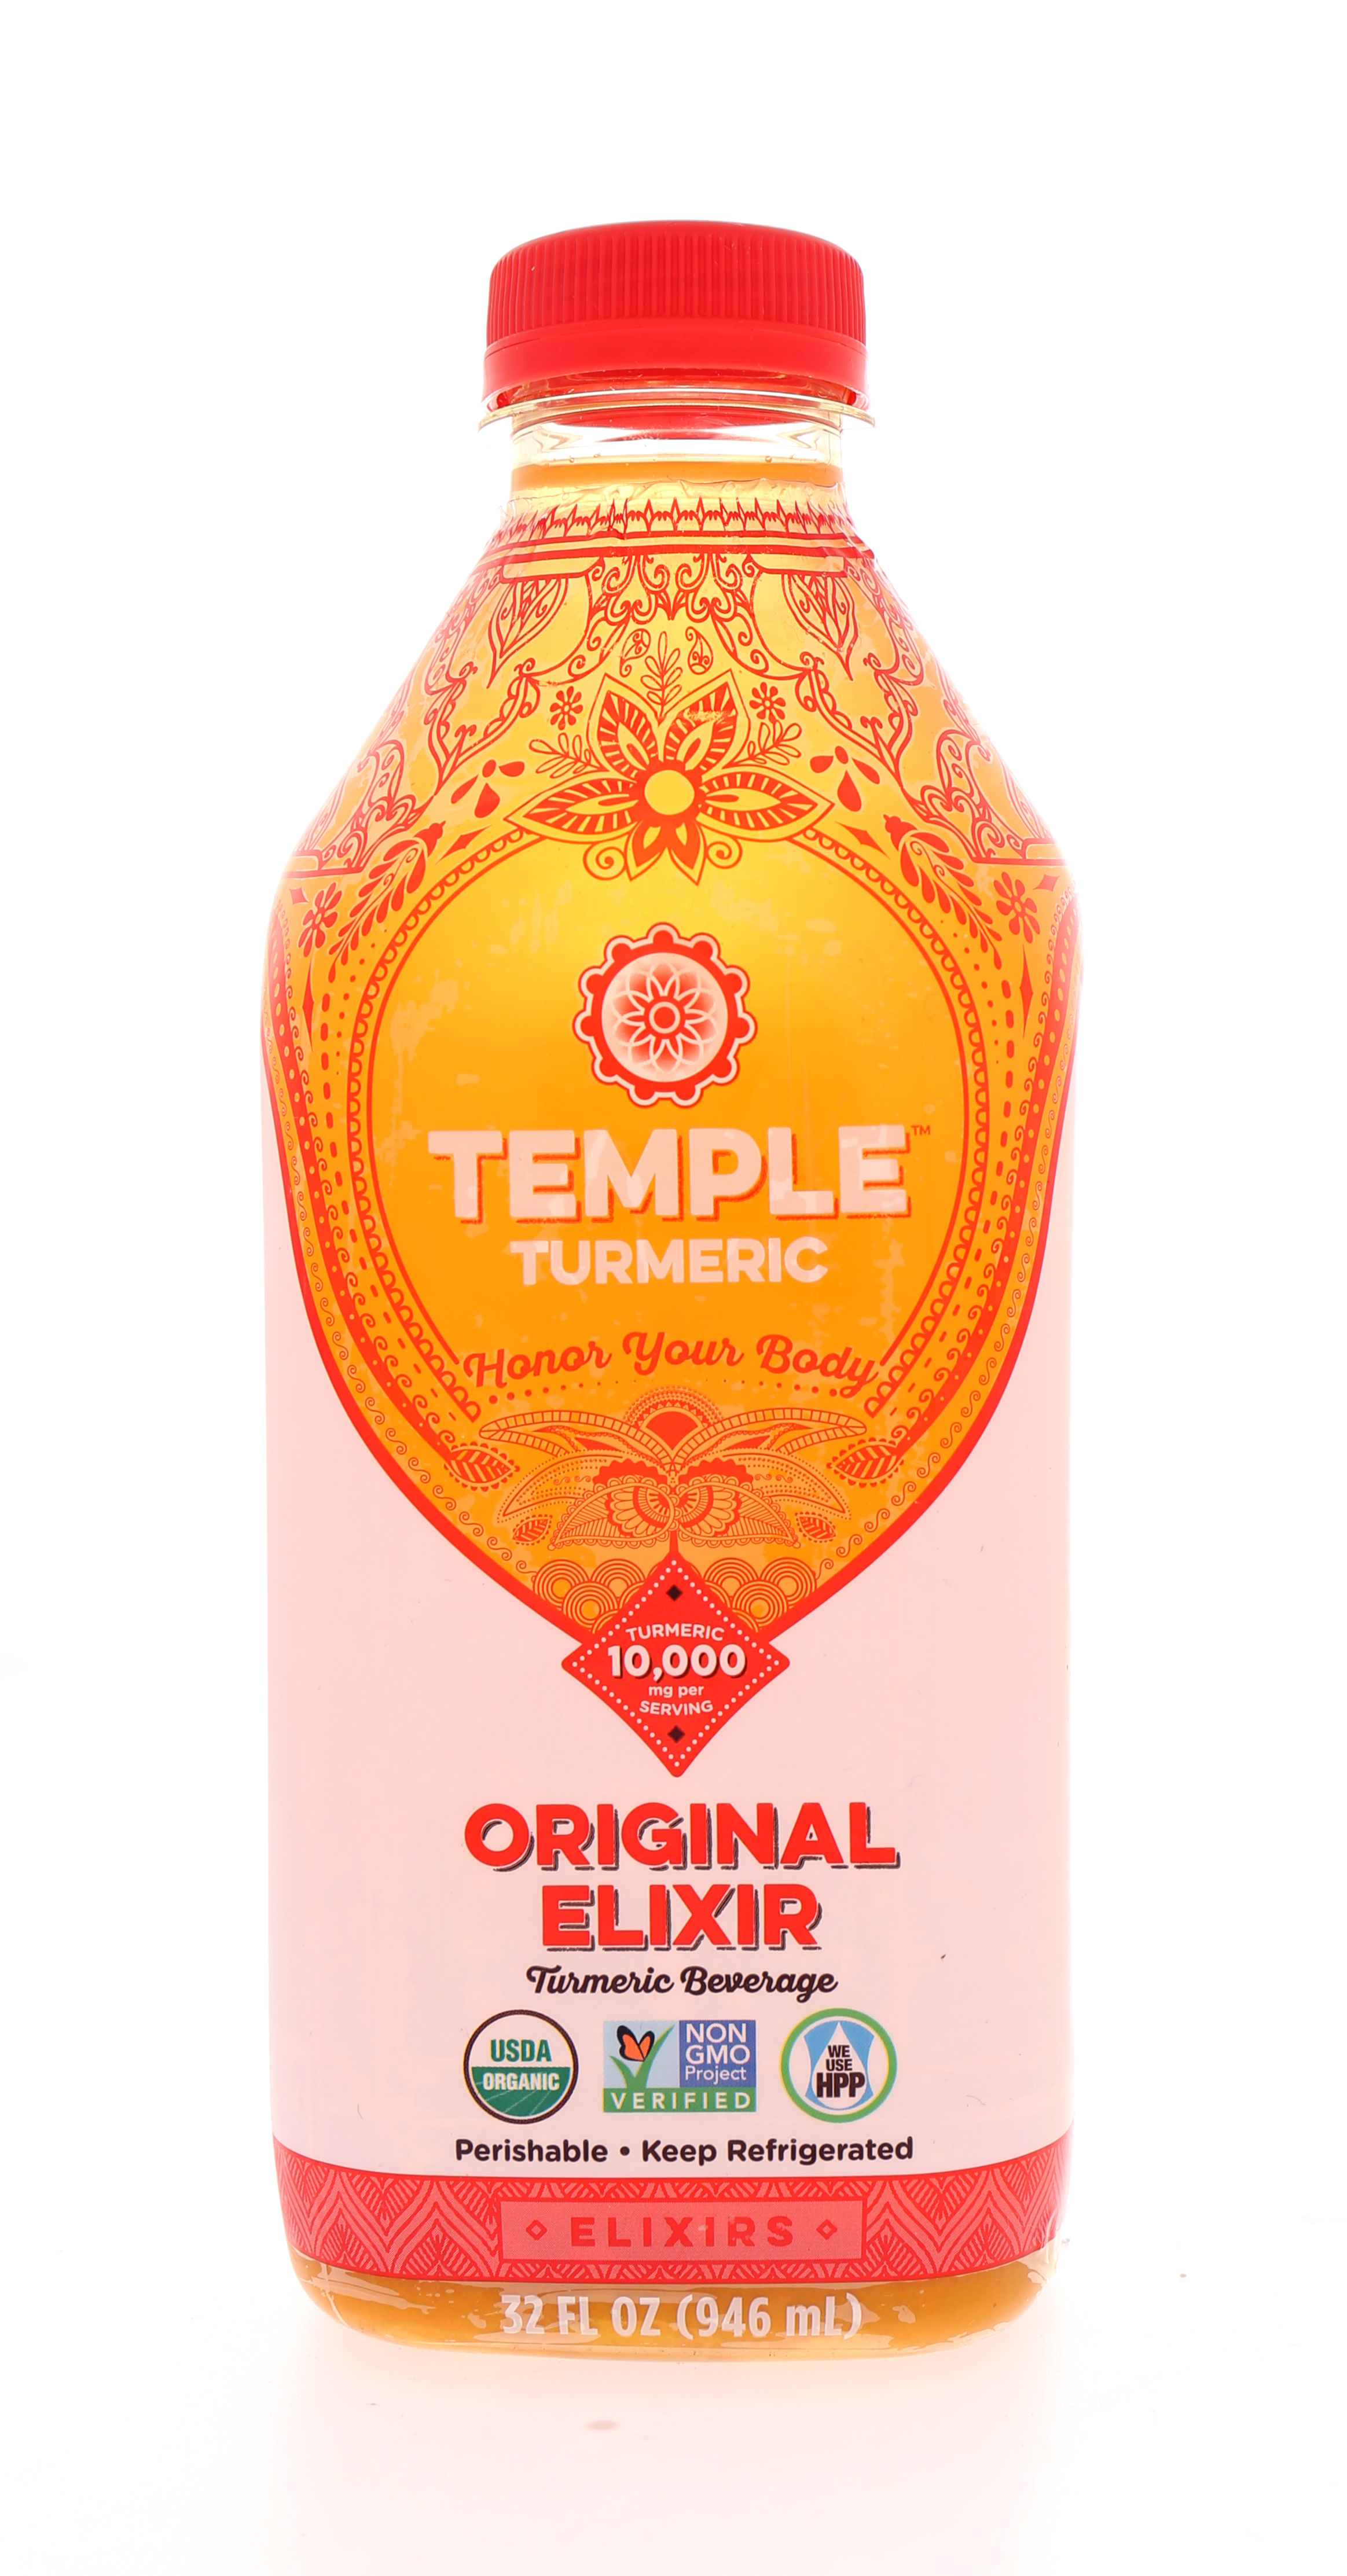 Original Elixir - 32 oz